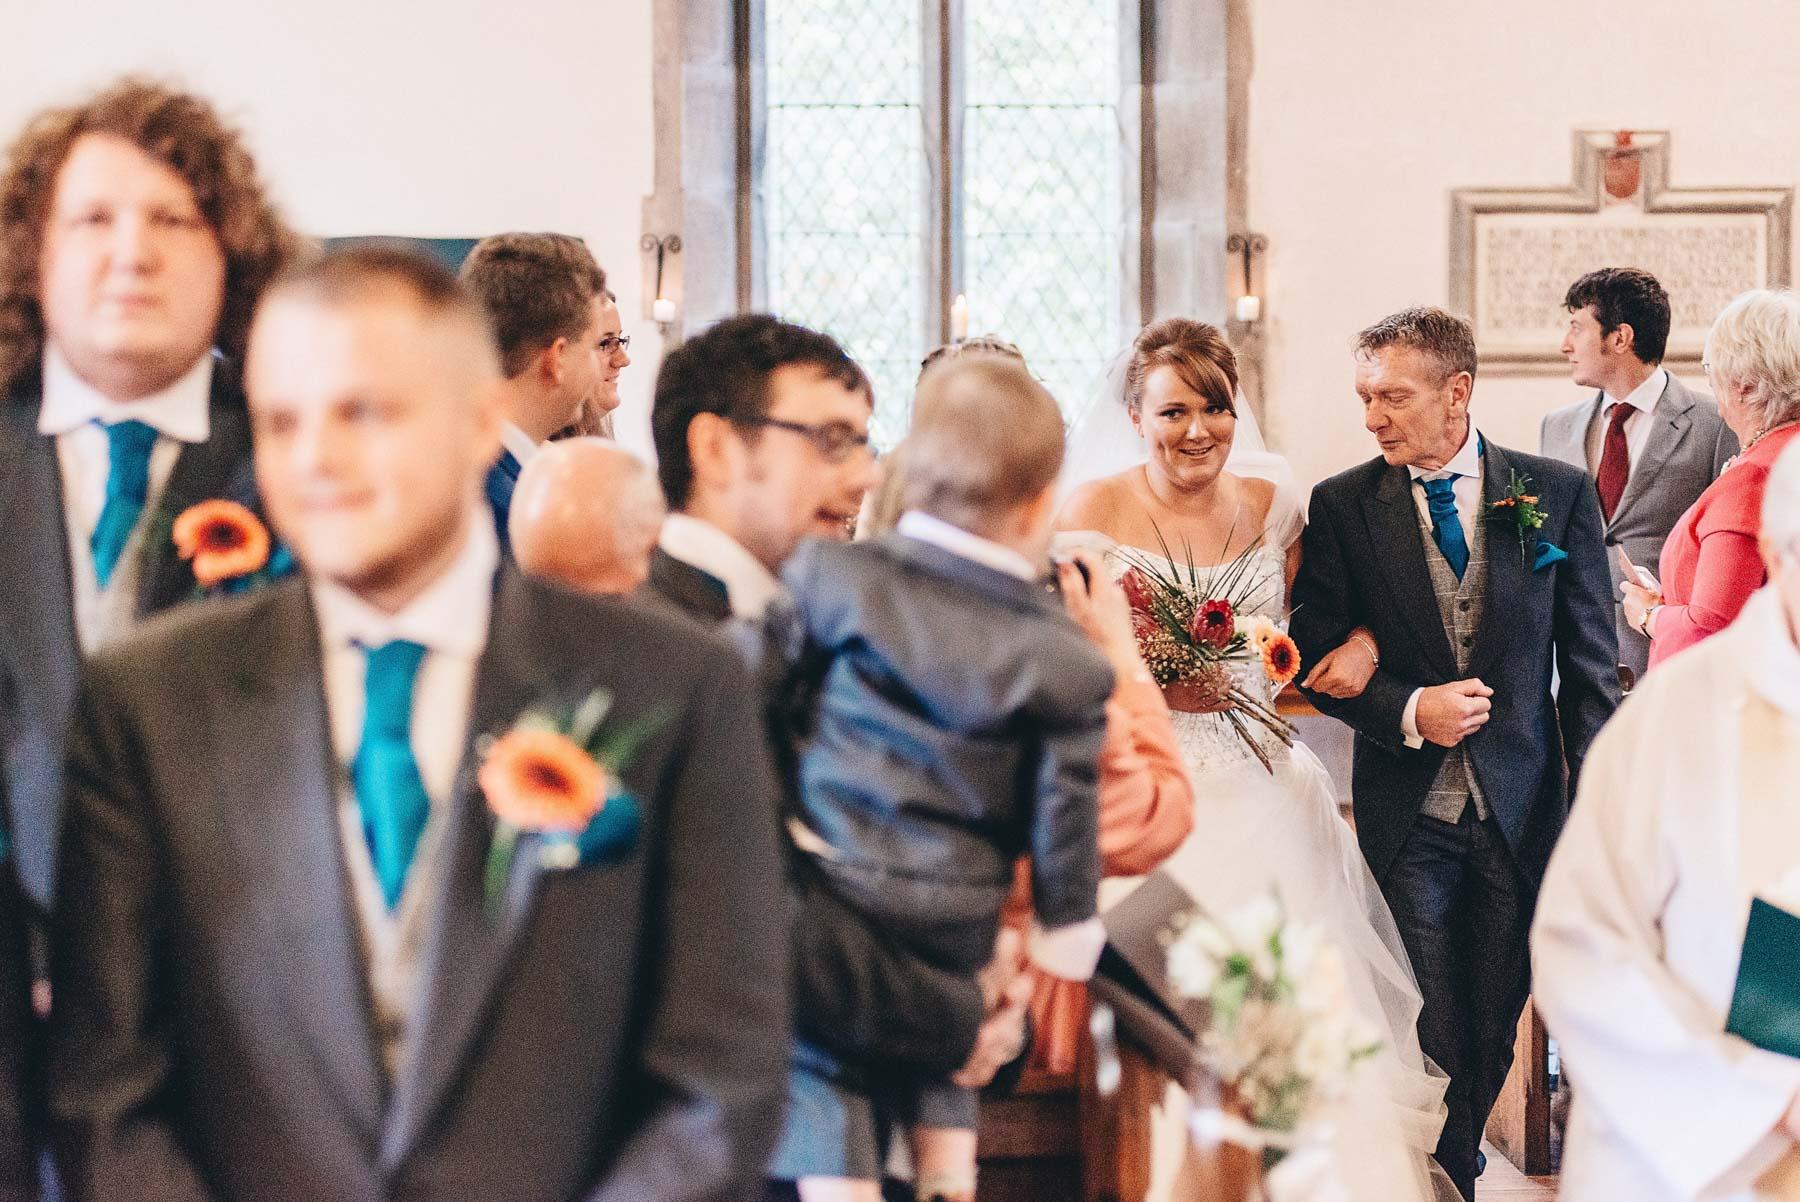 Friezland-Church-Saddleworth-Wedding-48.jpg